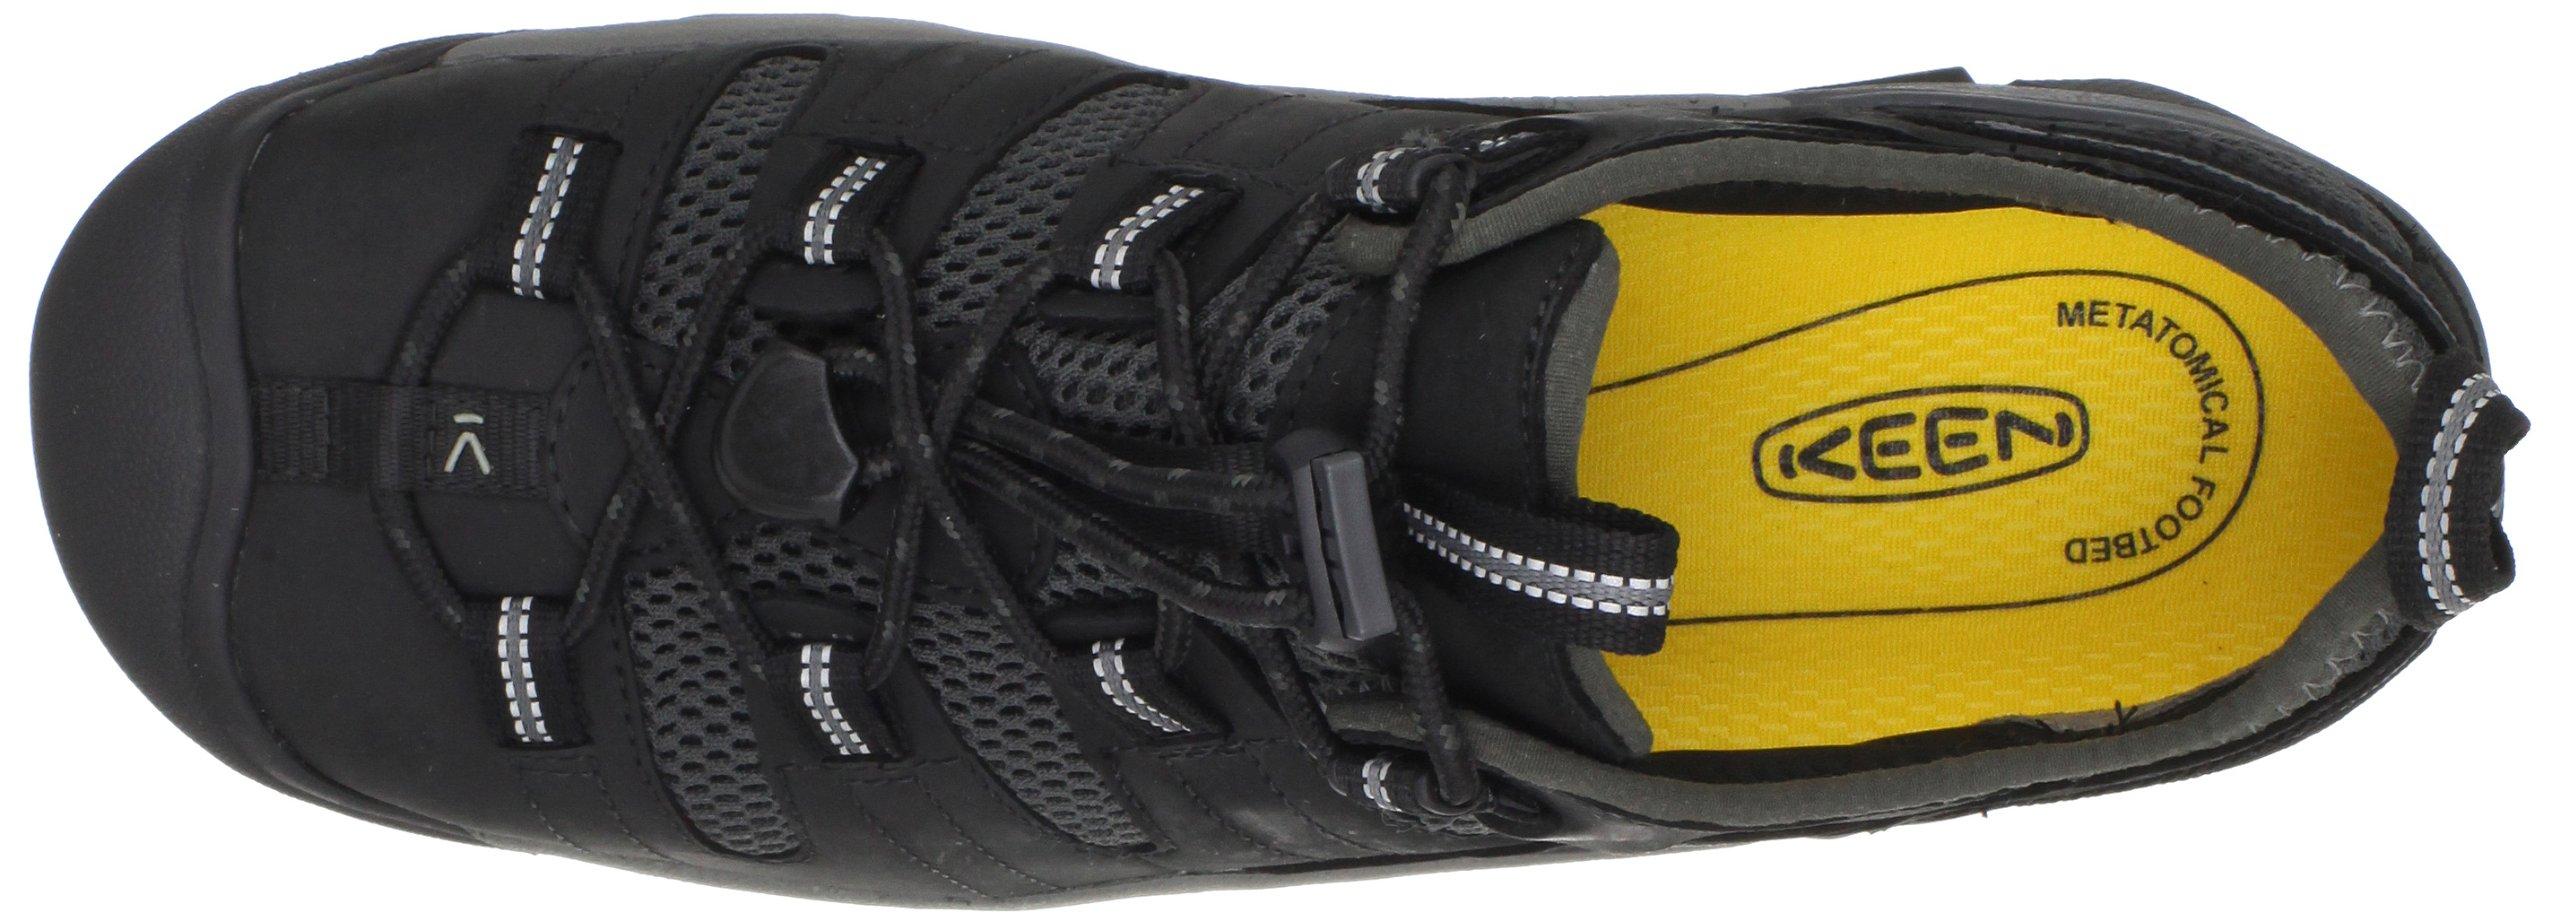 KEEN Utility Men's Atlanta Cool Steel Toe Work Shoe,Black,9.5 EE US by KEEN Utility (Image #7)